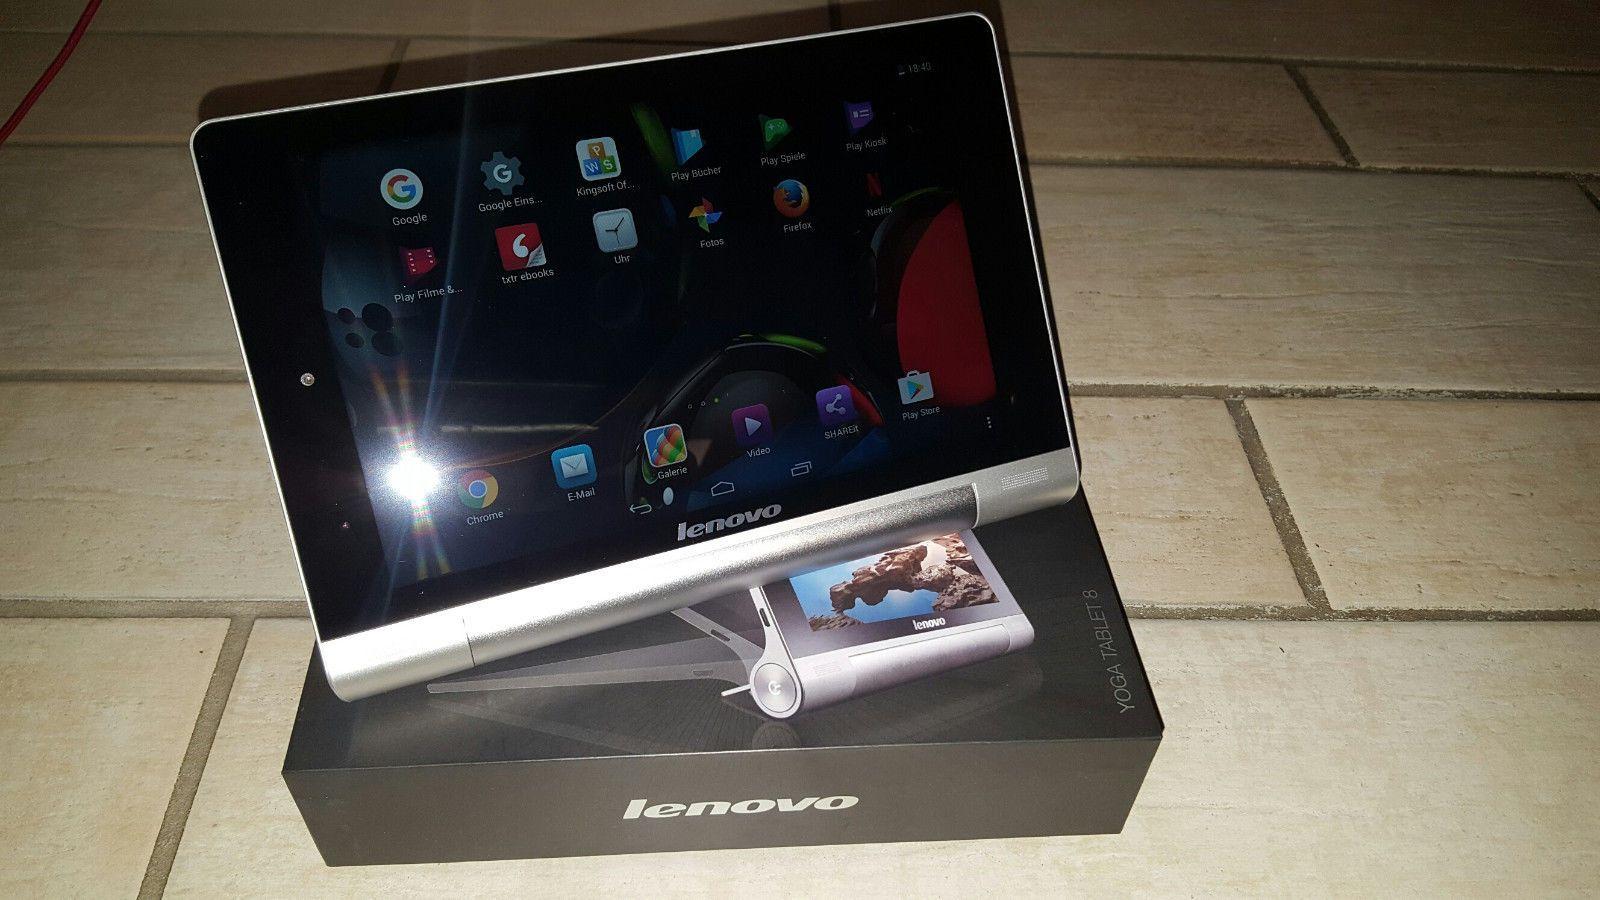 Lenovo Yoga Tablet 8 16gb Wlan Zoll Silbersparen25com Tab Sparen25